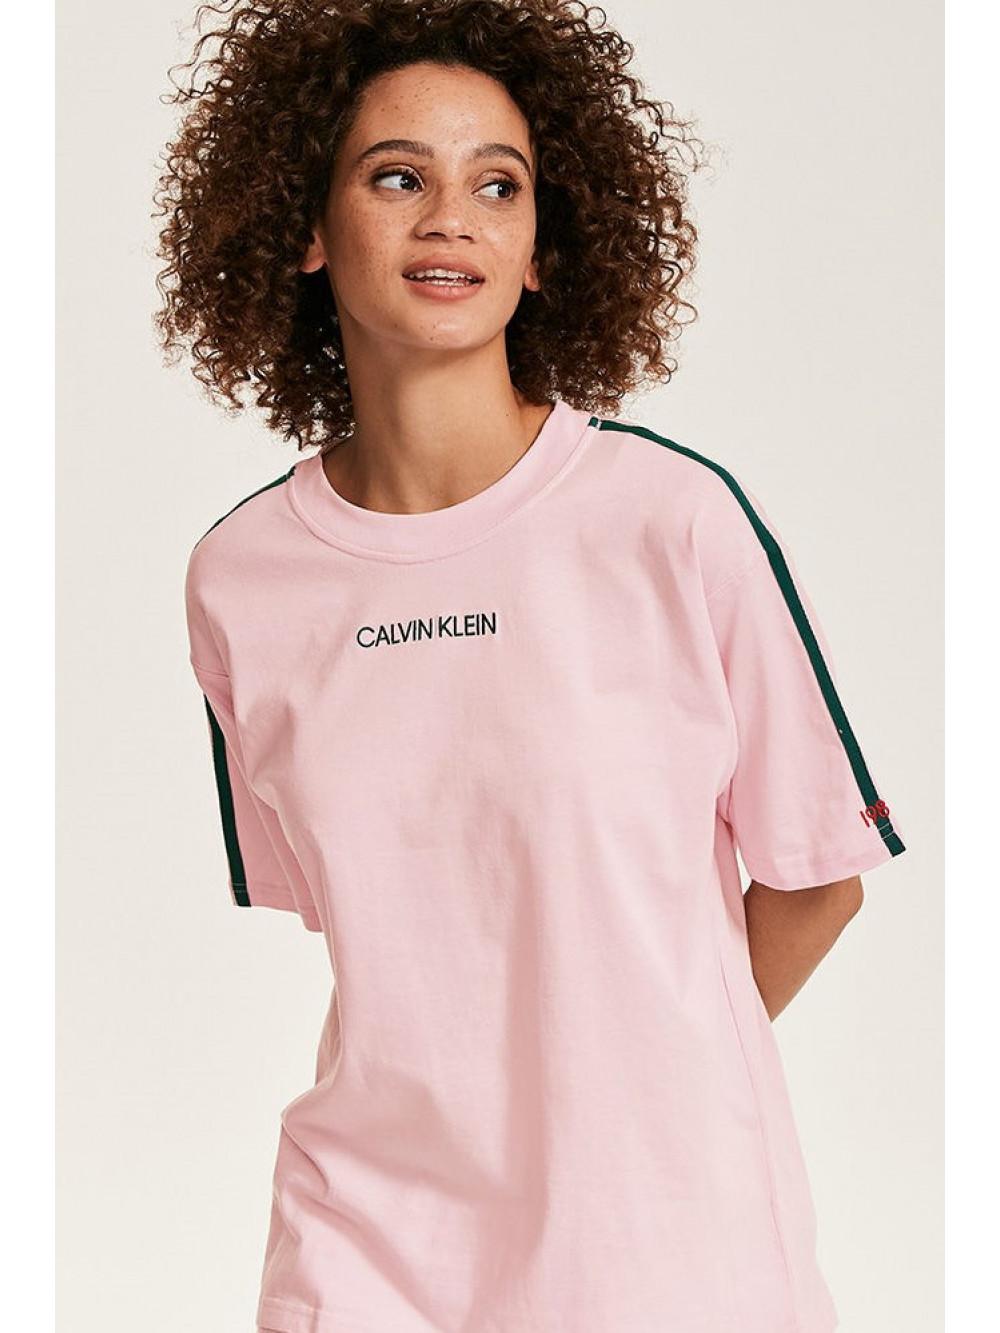 calvin klein t shirt damen rosa